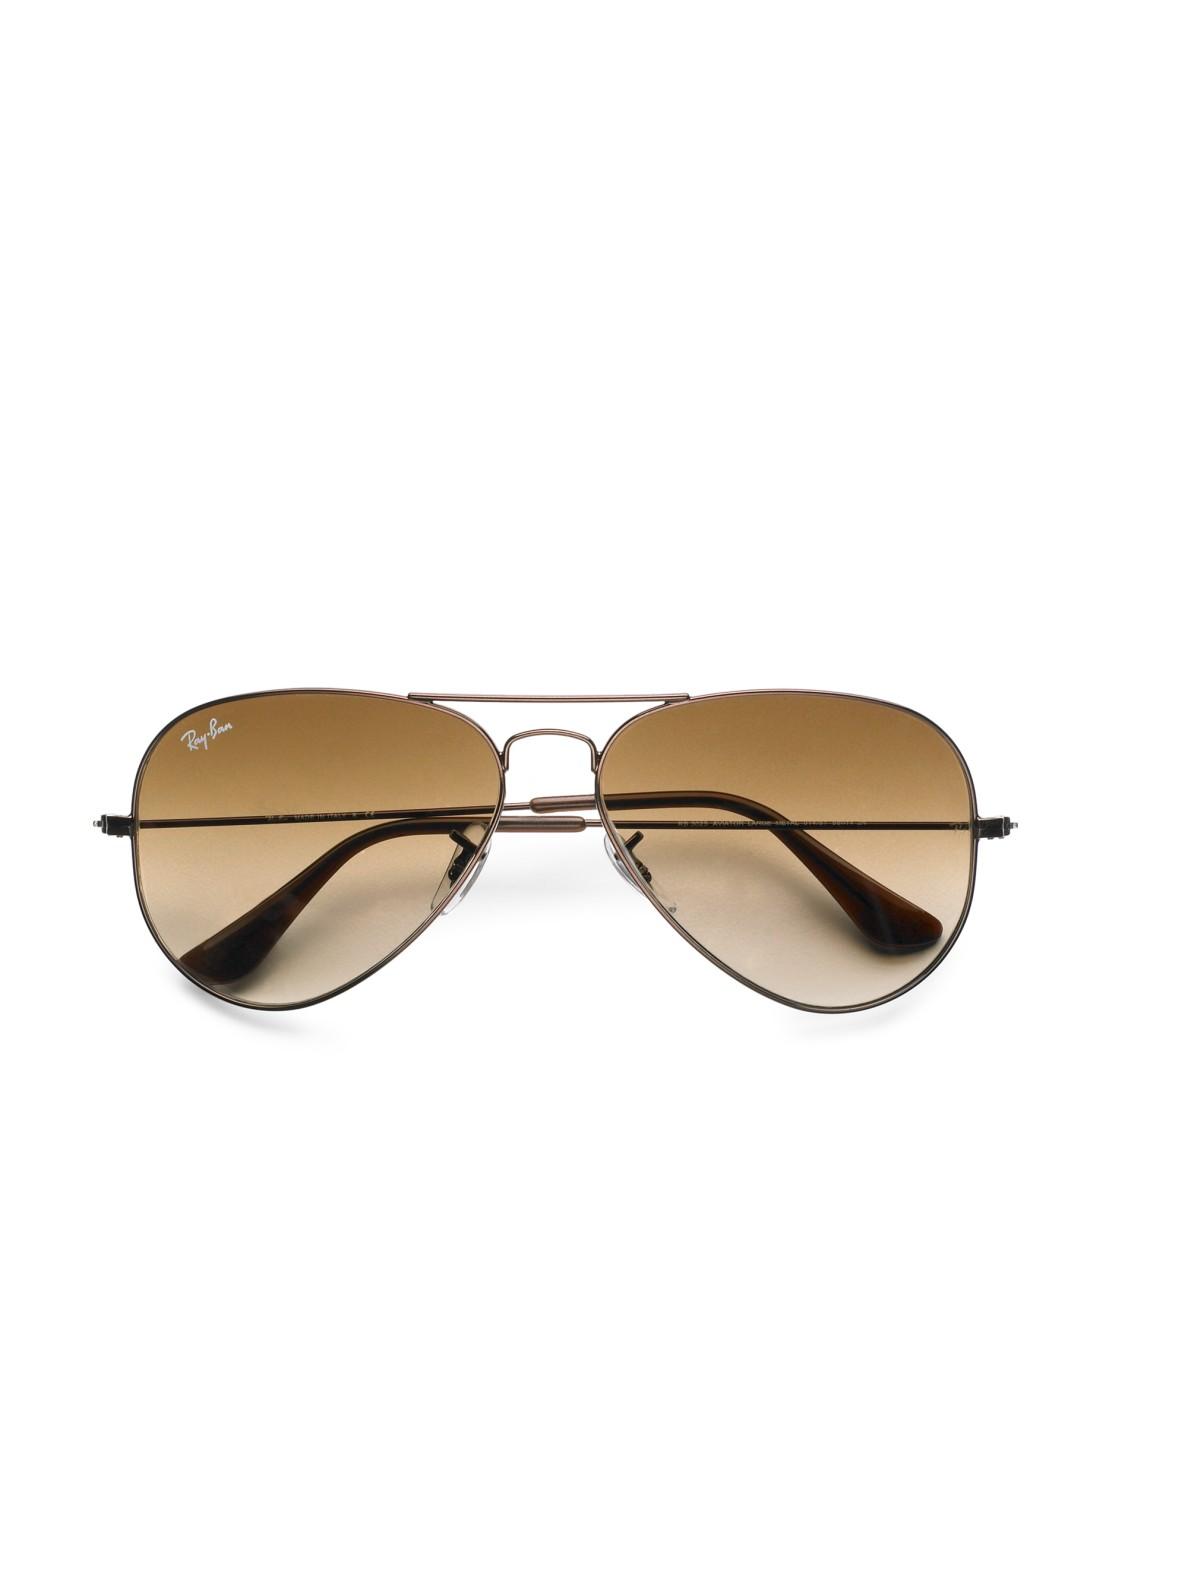 original ray ban black aviator sunglasses  original ray ban black aviator sunglasses